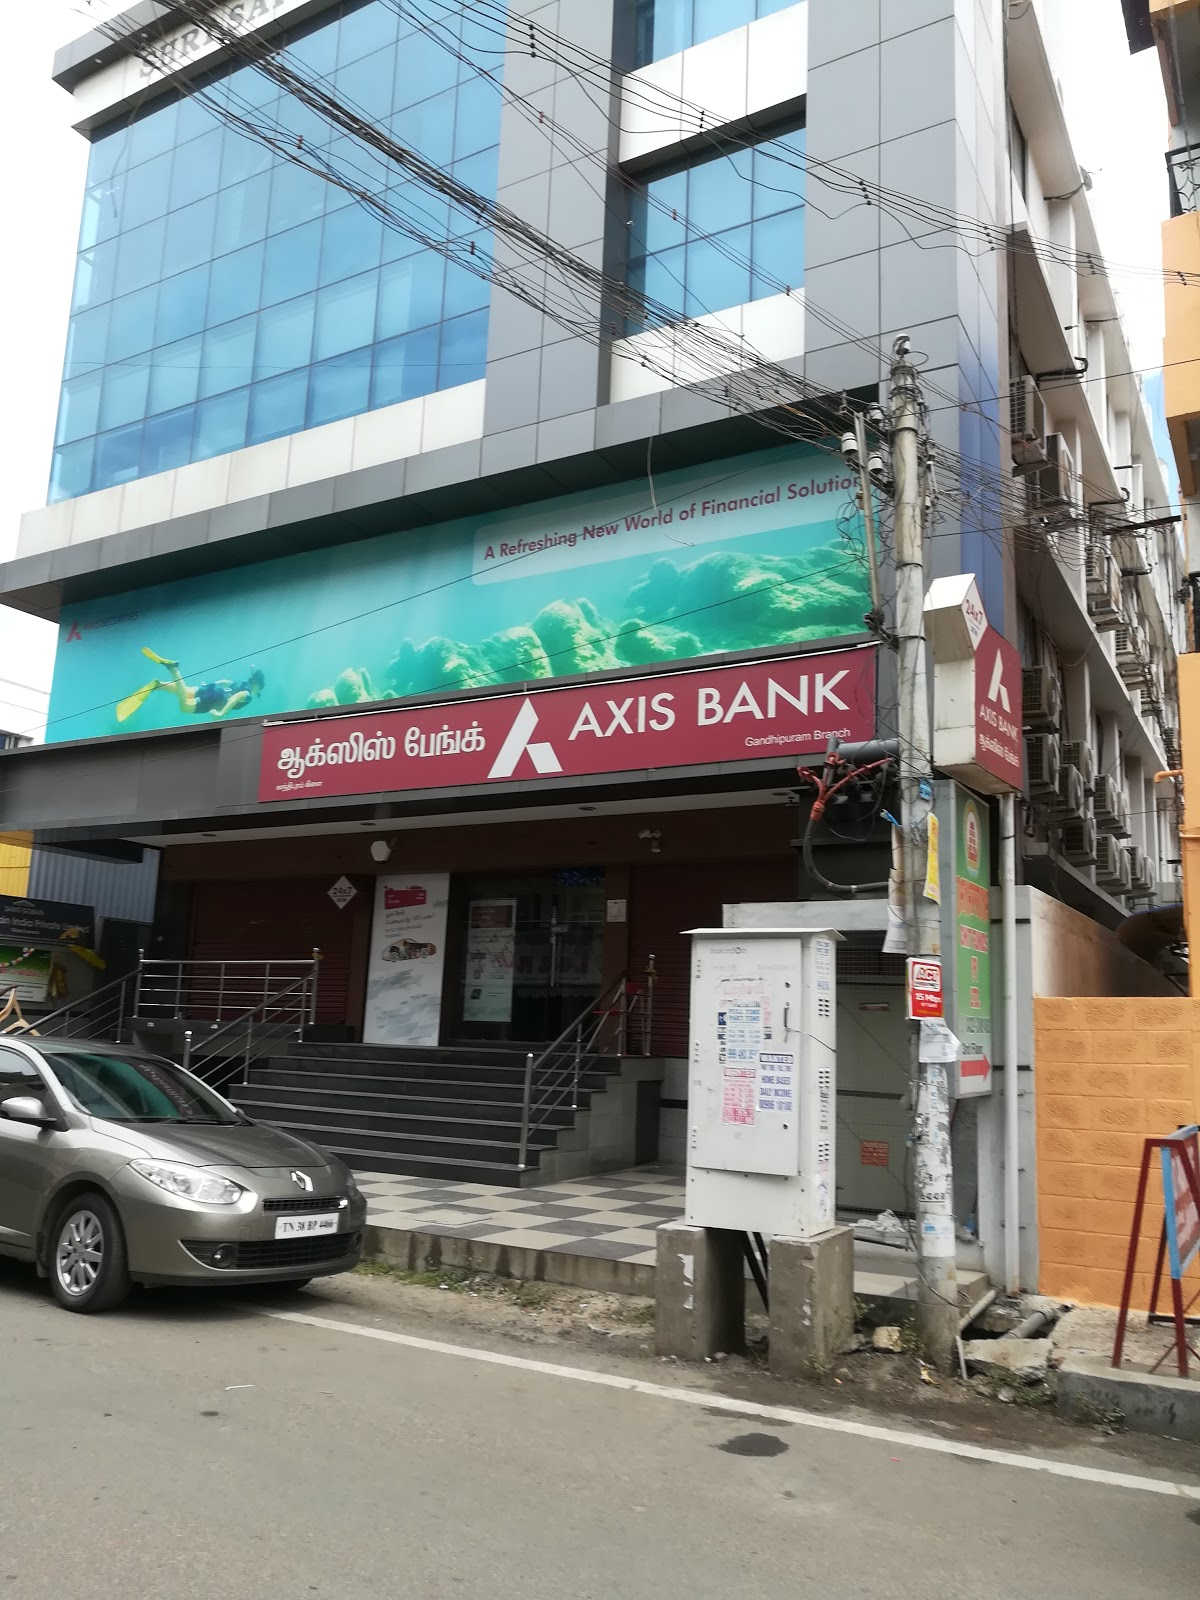 blood bank Axis Bank near Gandhipuram Tamil Nadu